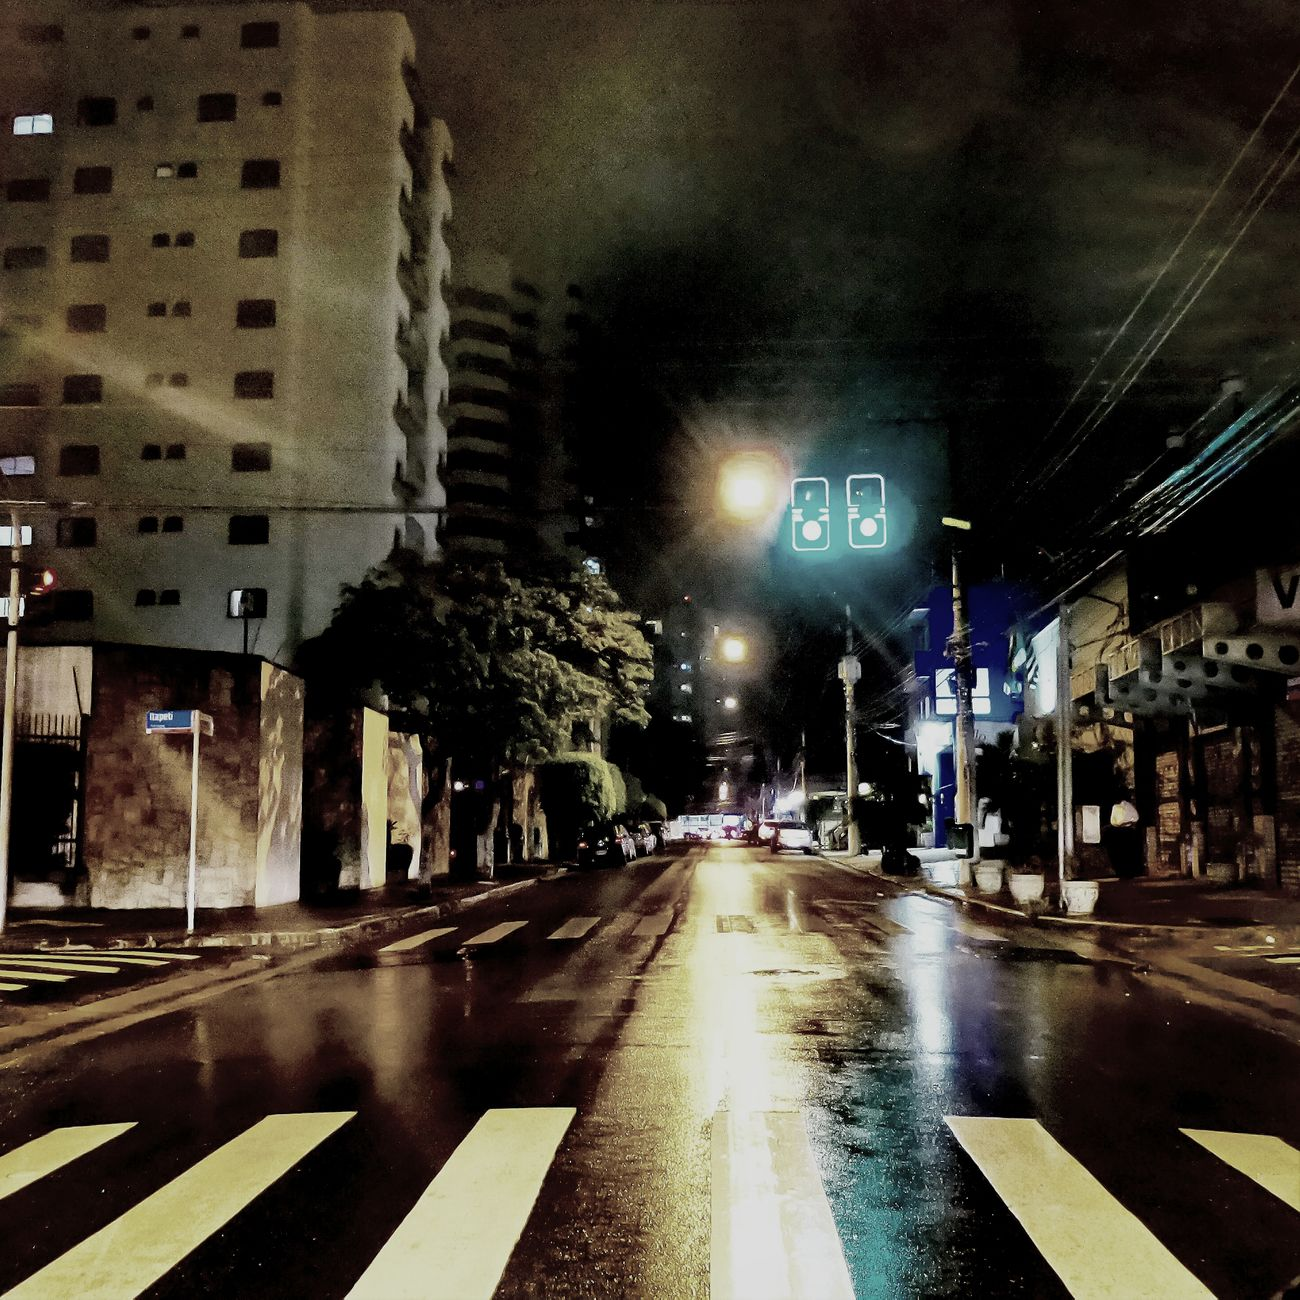 Pela noite do Tatuapé. Rua Apucarana. Vivatatuape Analiafranco Tatuape